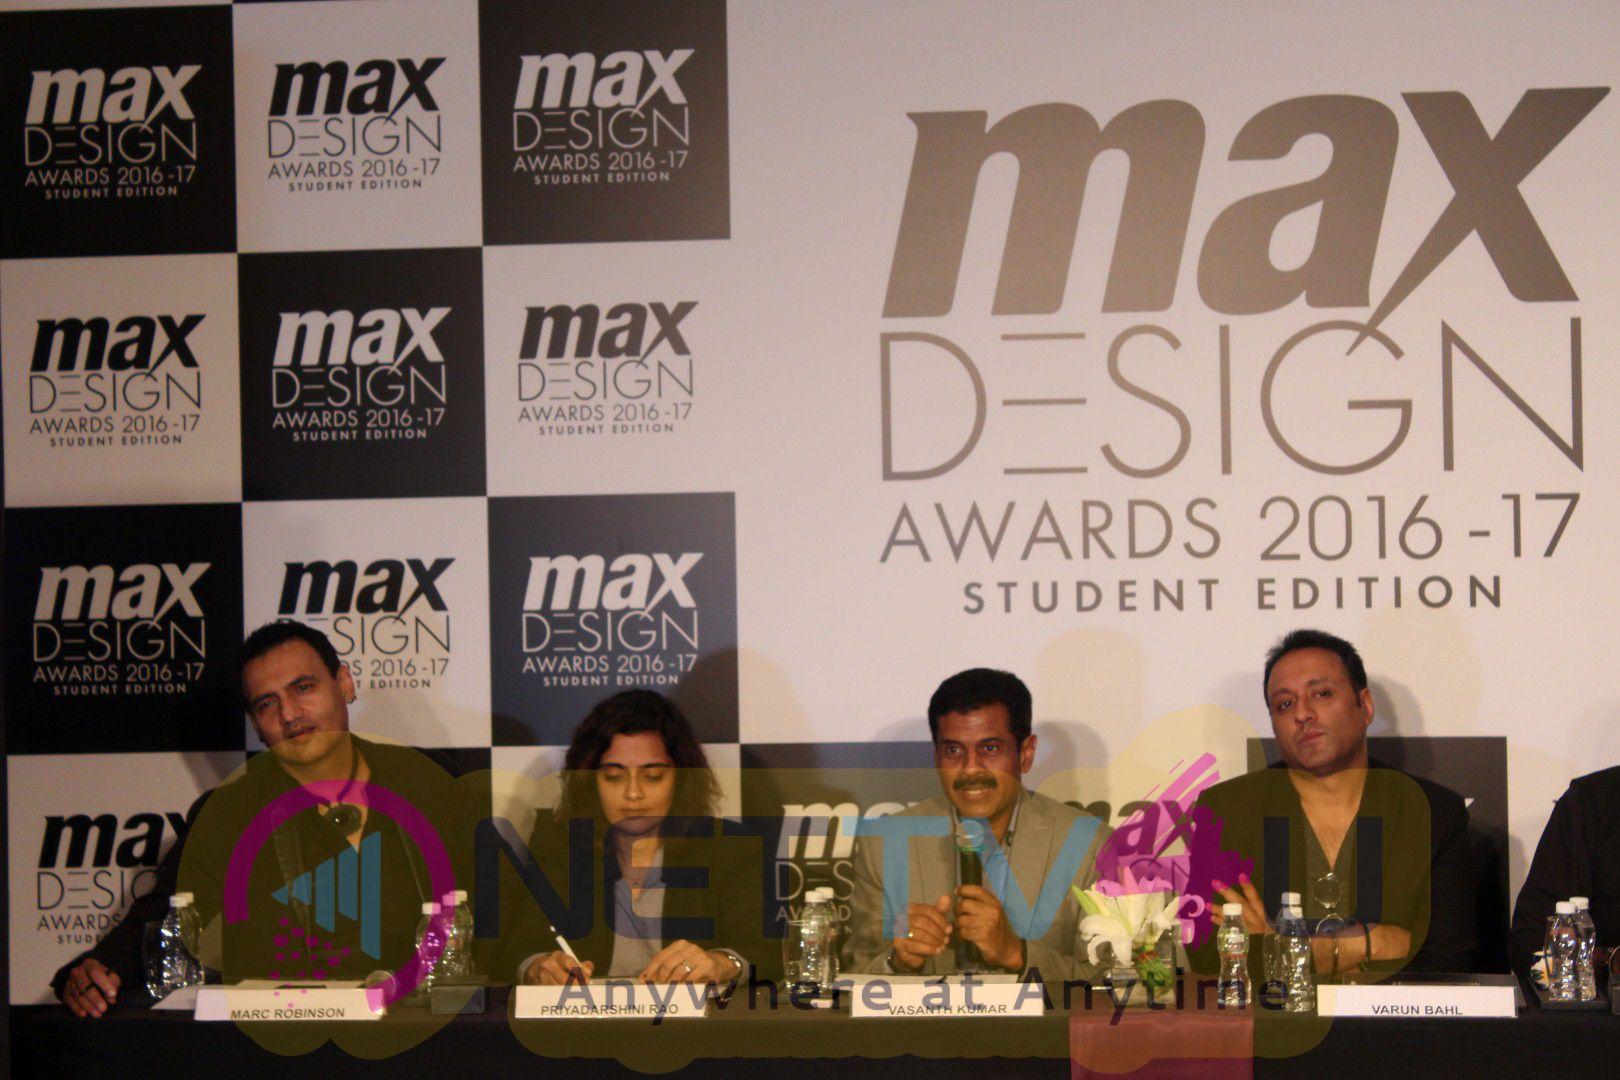 Photo Of PC Of Max Design Awards 2017